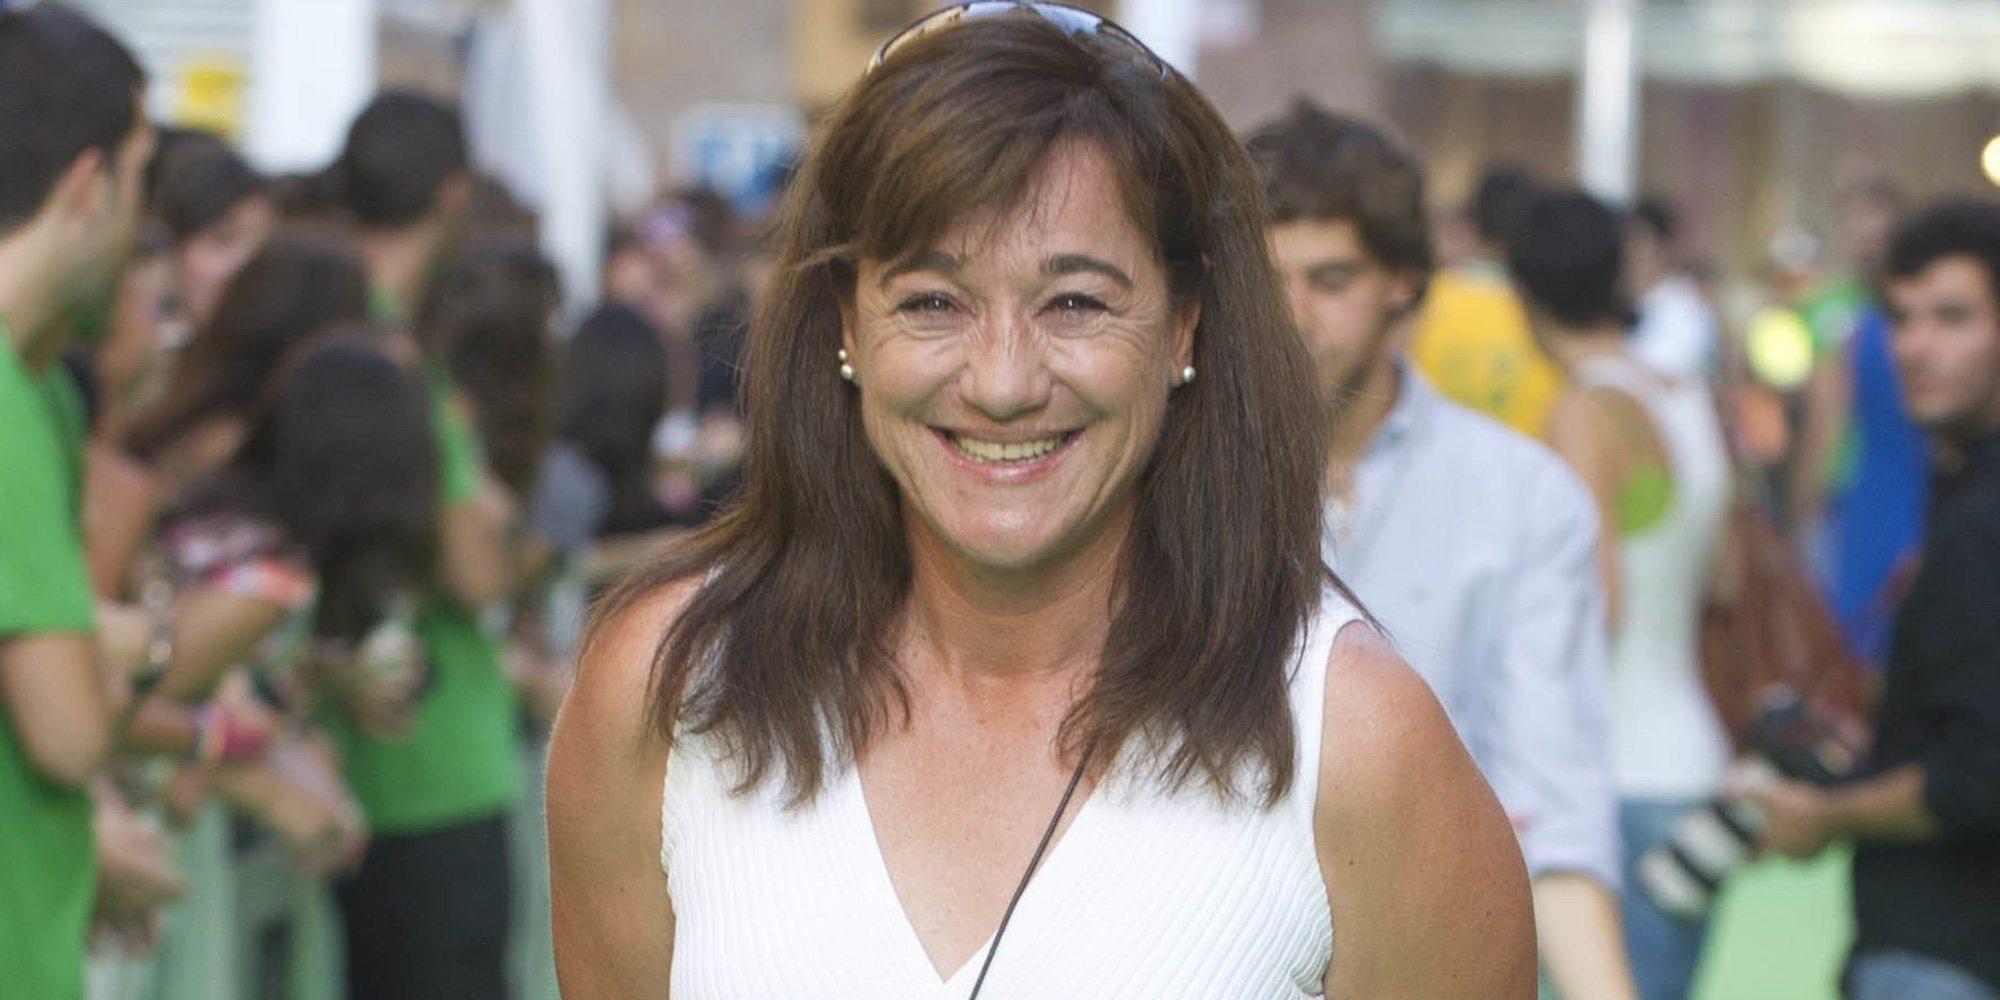 Blanca Fernández Ochoa compró queso en un supermercado antes de desaparecer